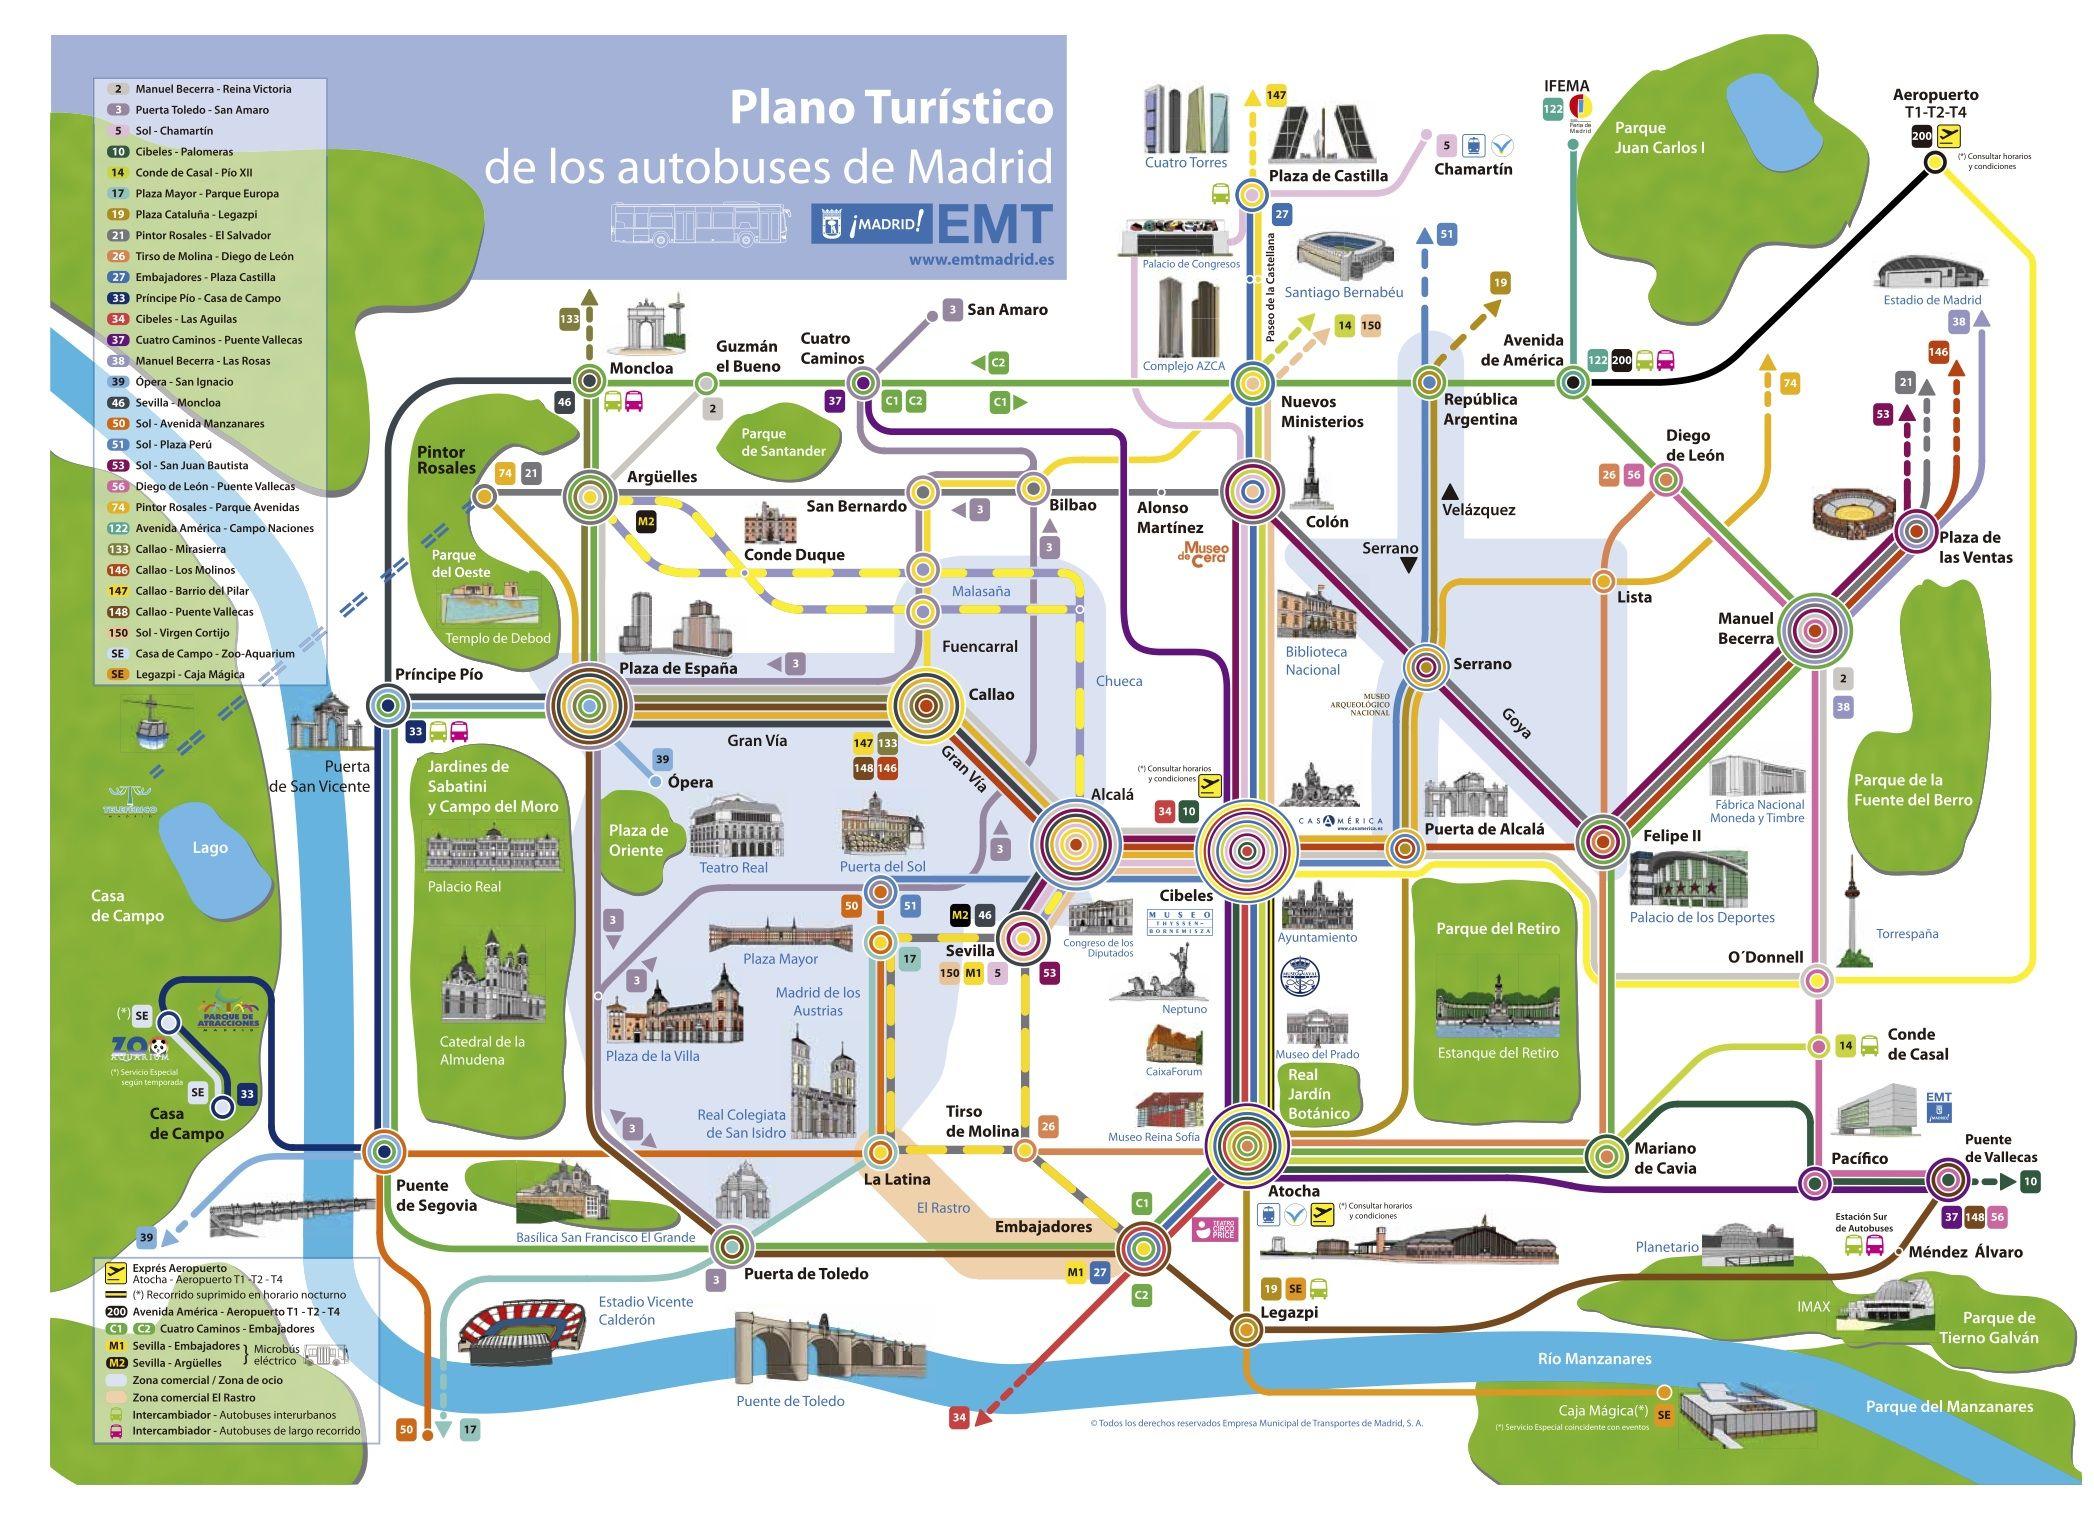 Sevilla lugares turisticos buscar con google travel for Lugares turisticos de espana madrid